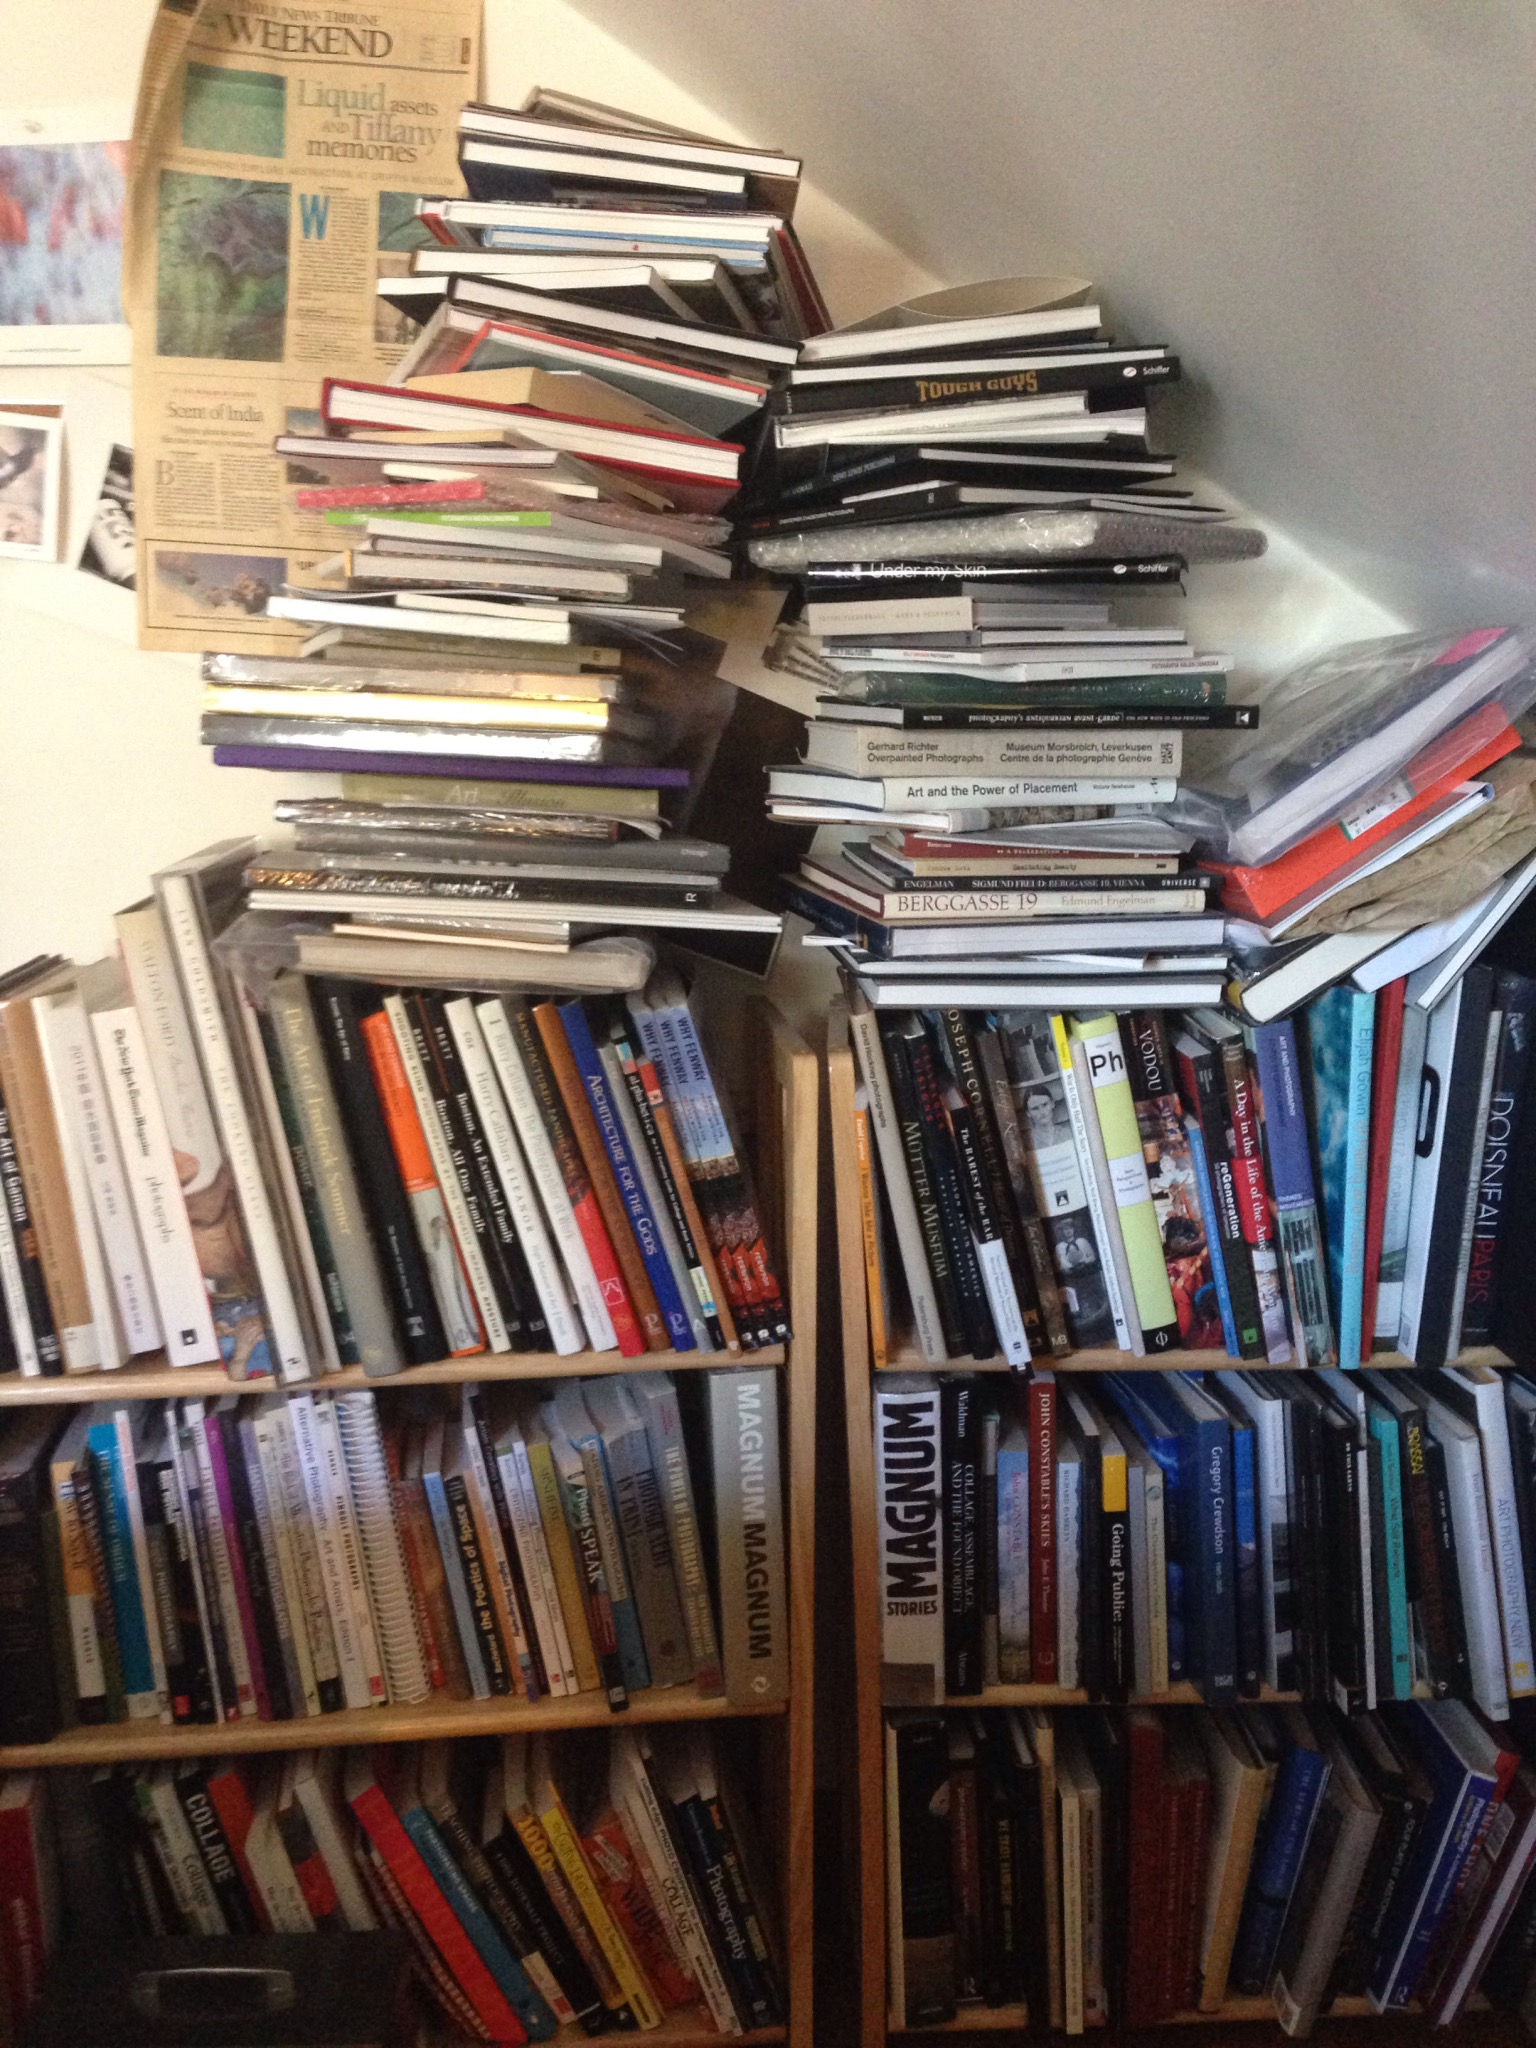 Paula Tognarelli's towering heap of books.